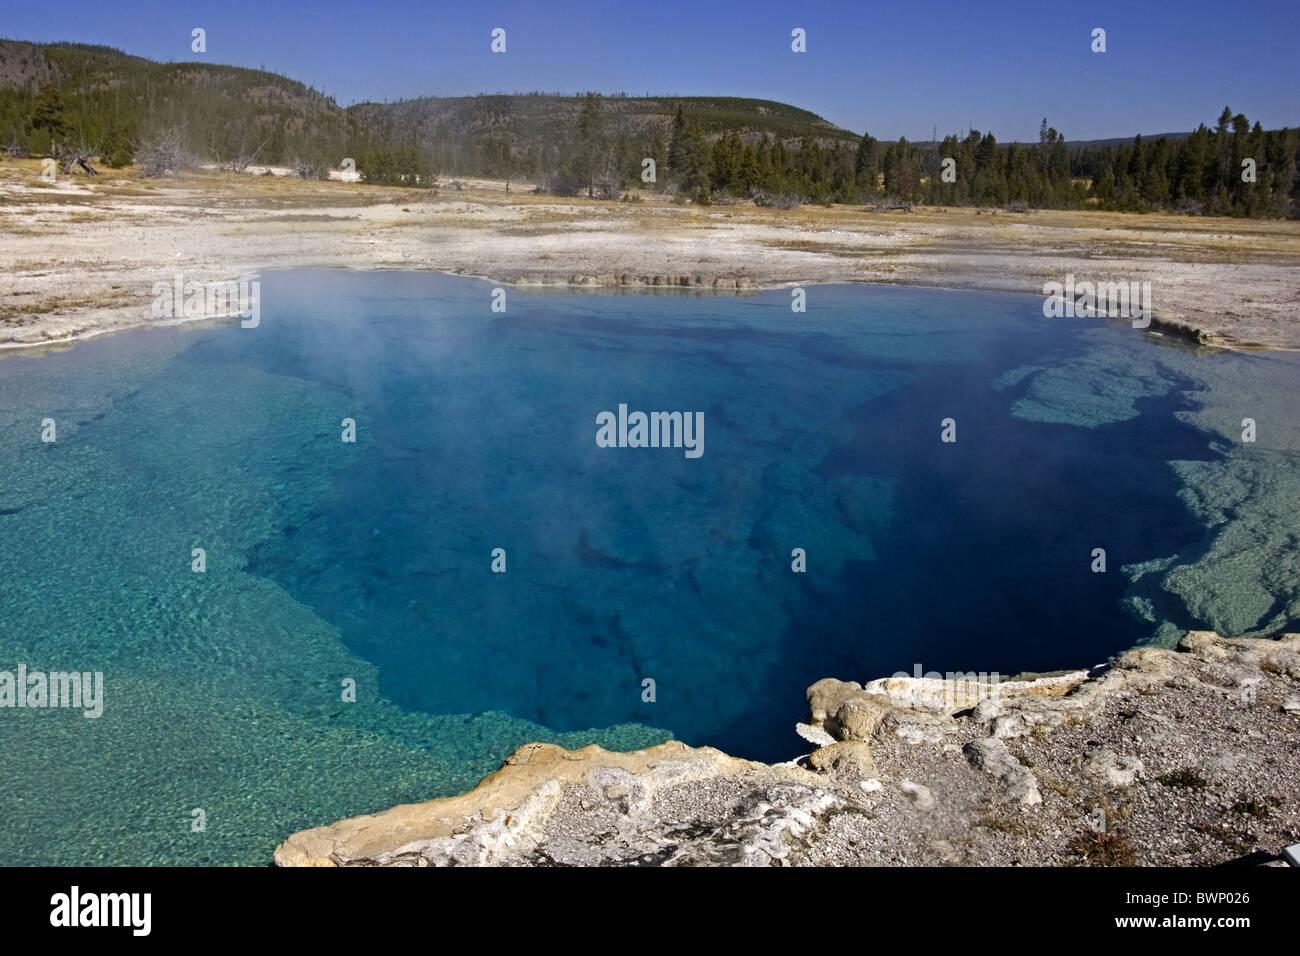 Piscina Sapphire, Biscuit Basin, Yellowstone Foto de stock